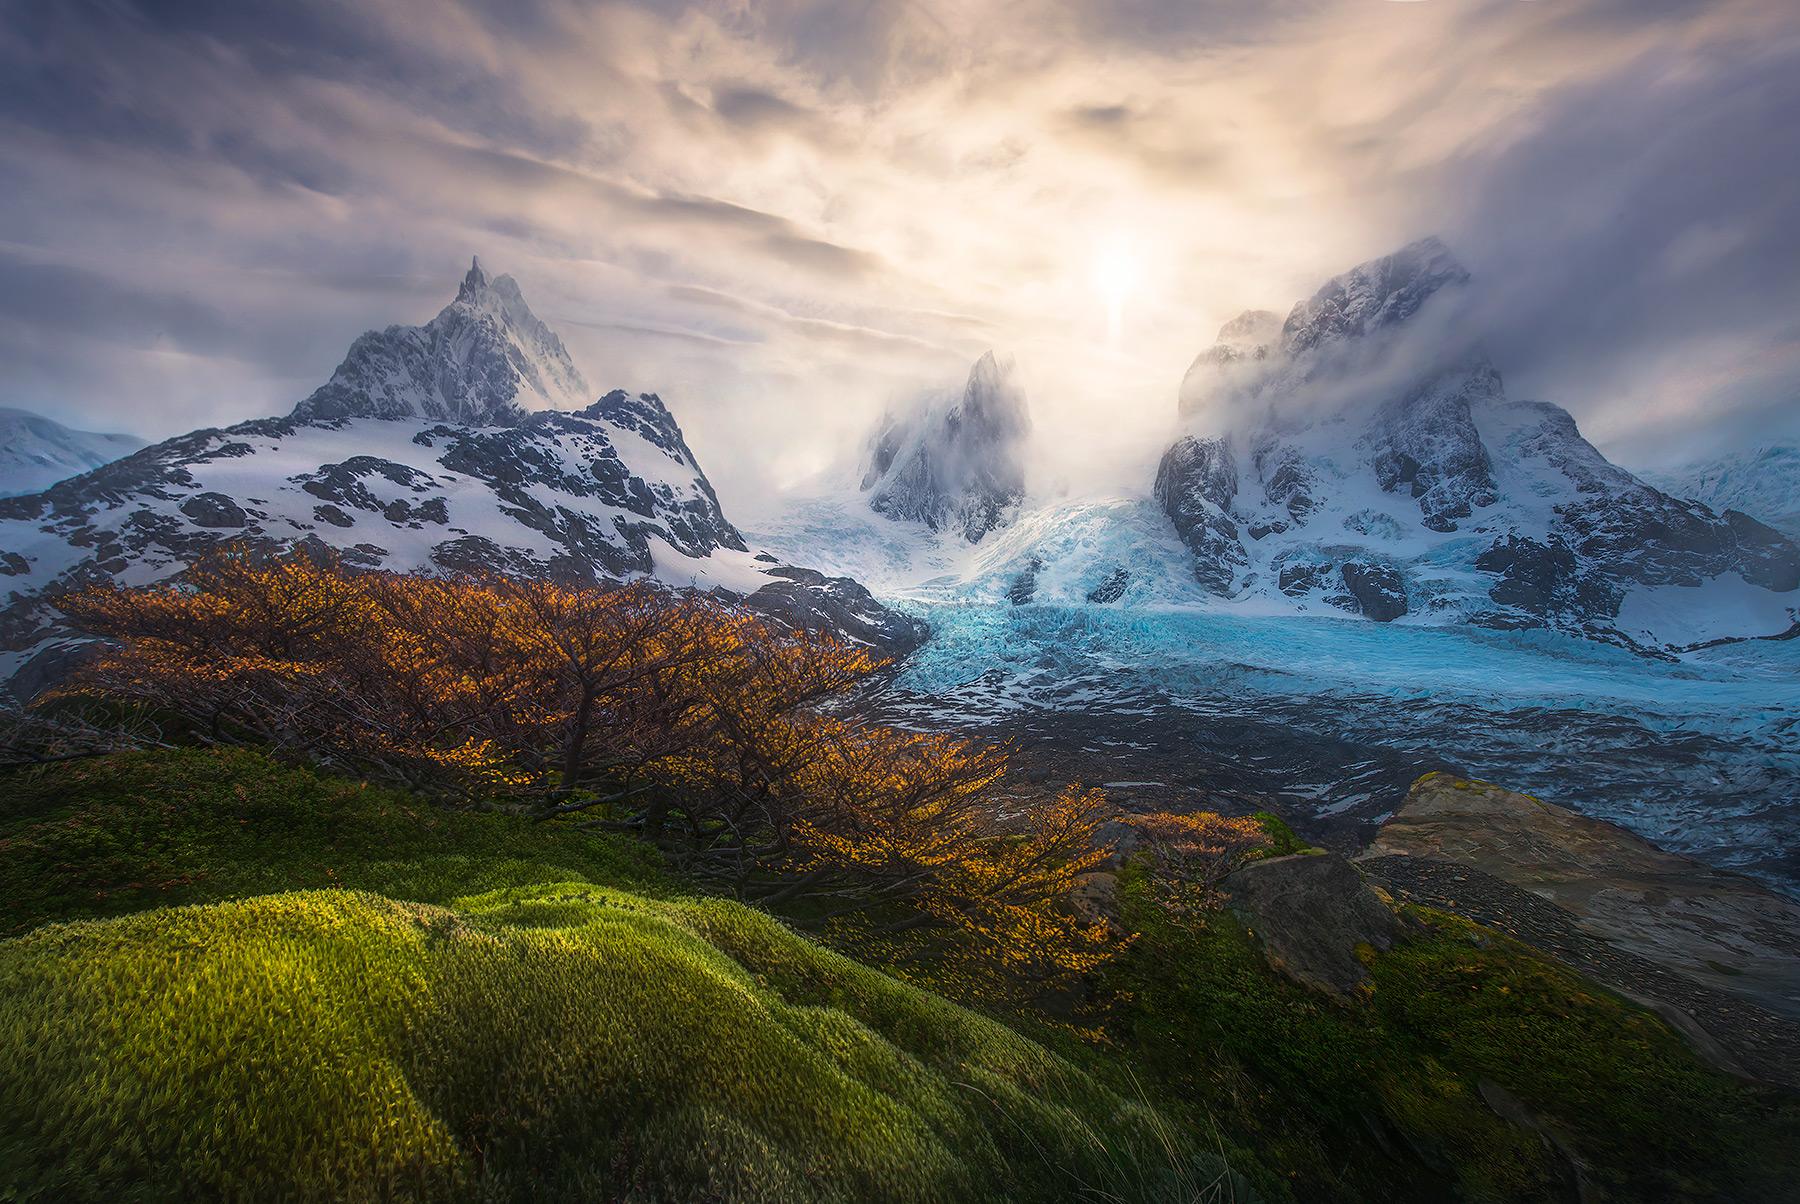 Moss, autumn, mountains, Chile, fiords, rainforest, Patagonia, glacier, photo